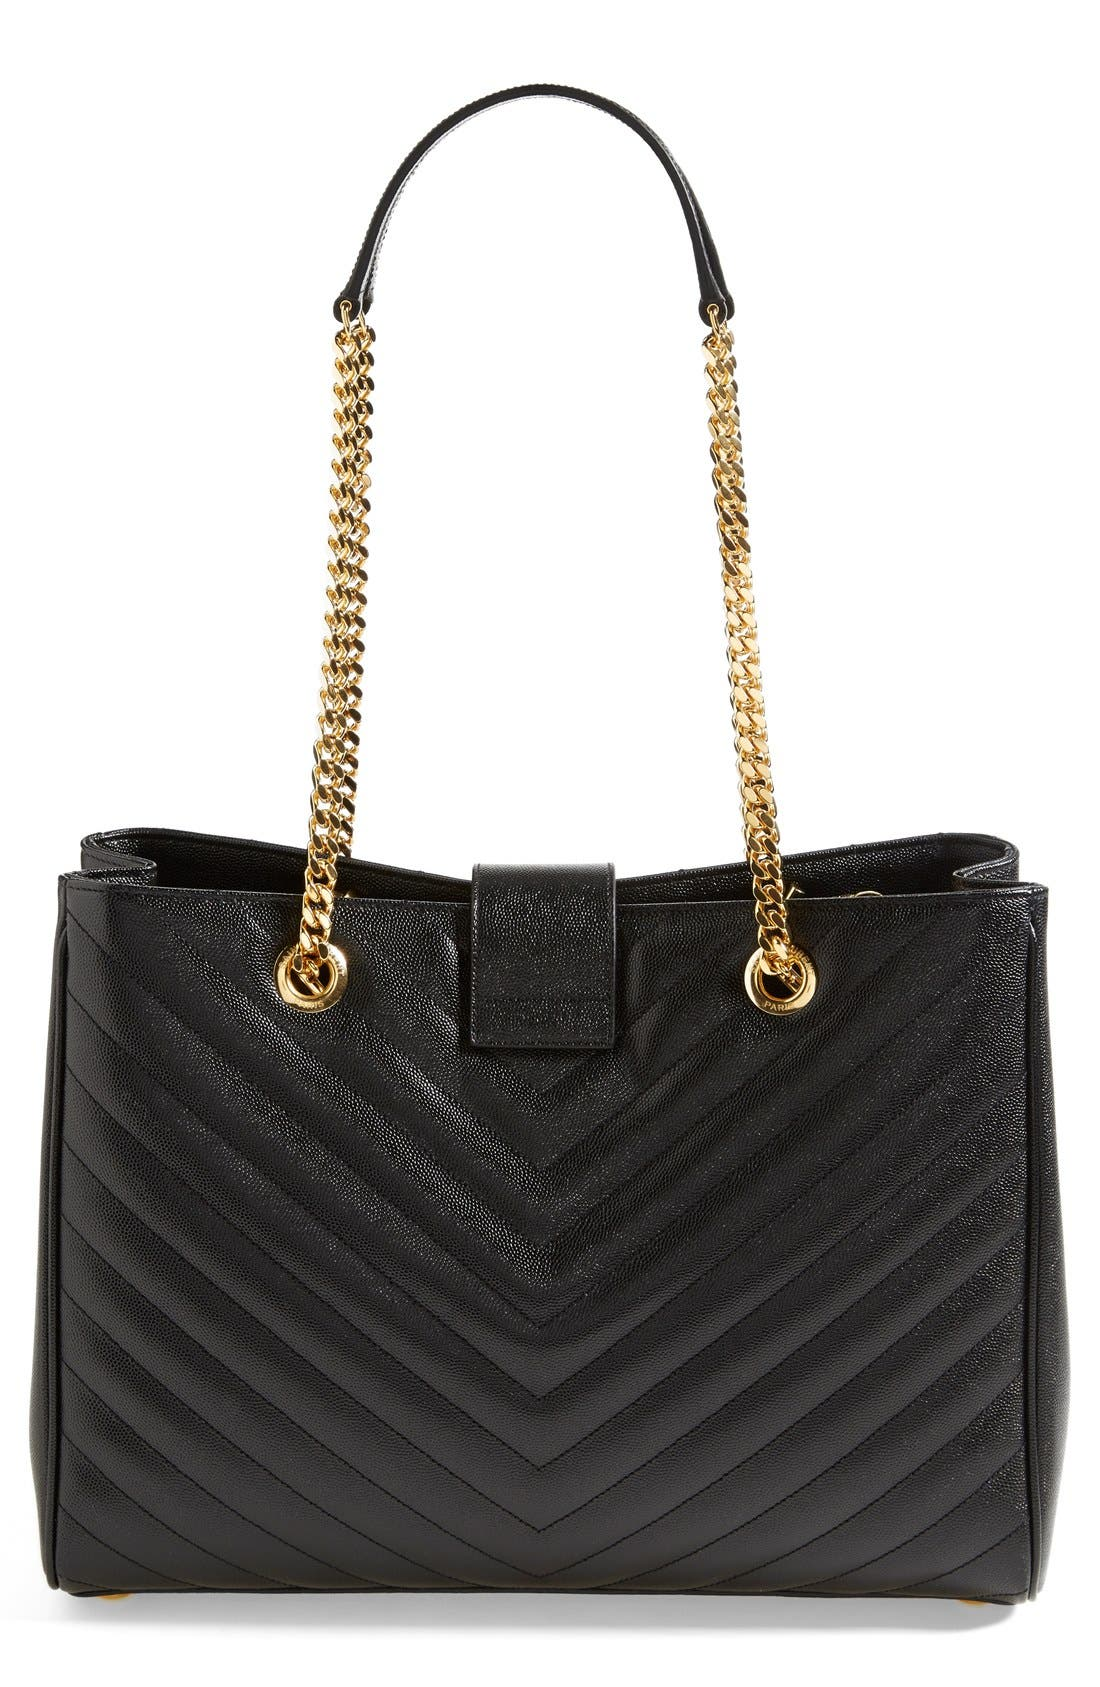 Alternate Image 3  - Saint Laurent 'Monogram' Leather Shopper